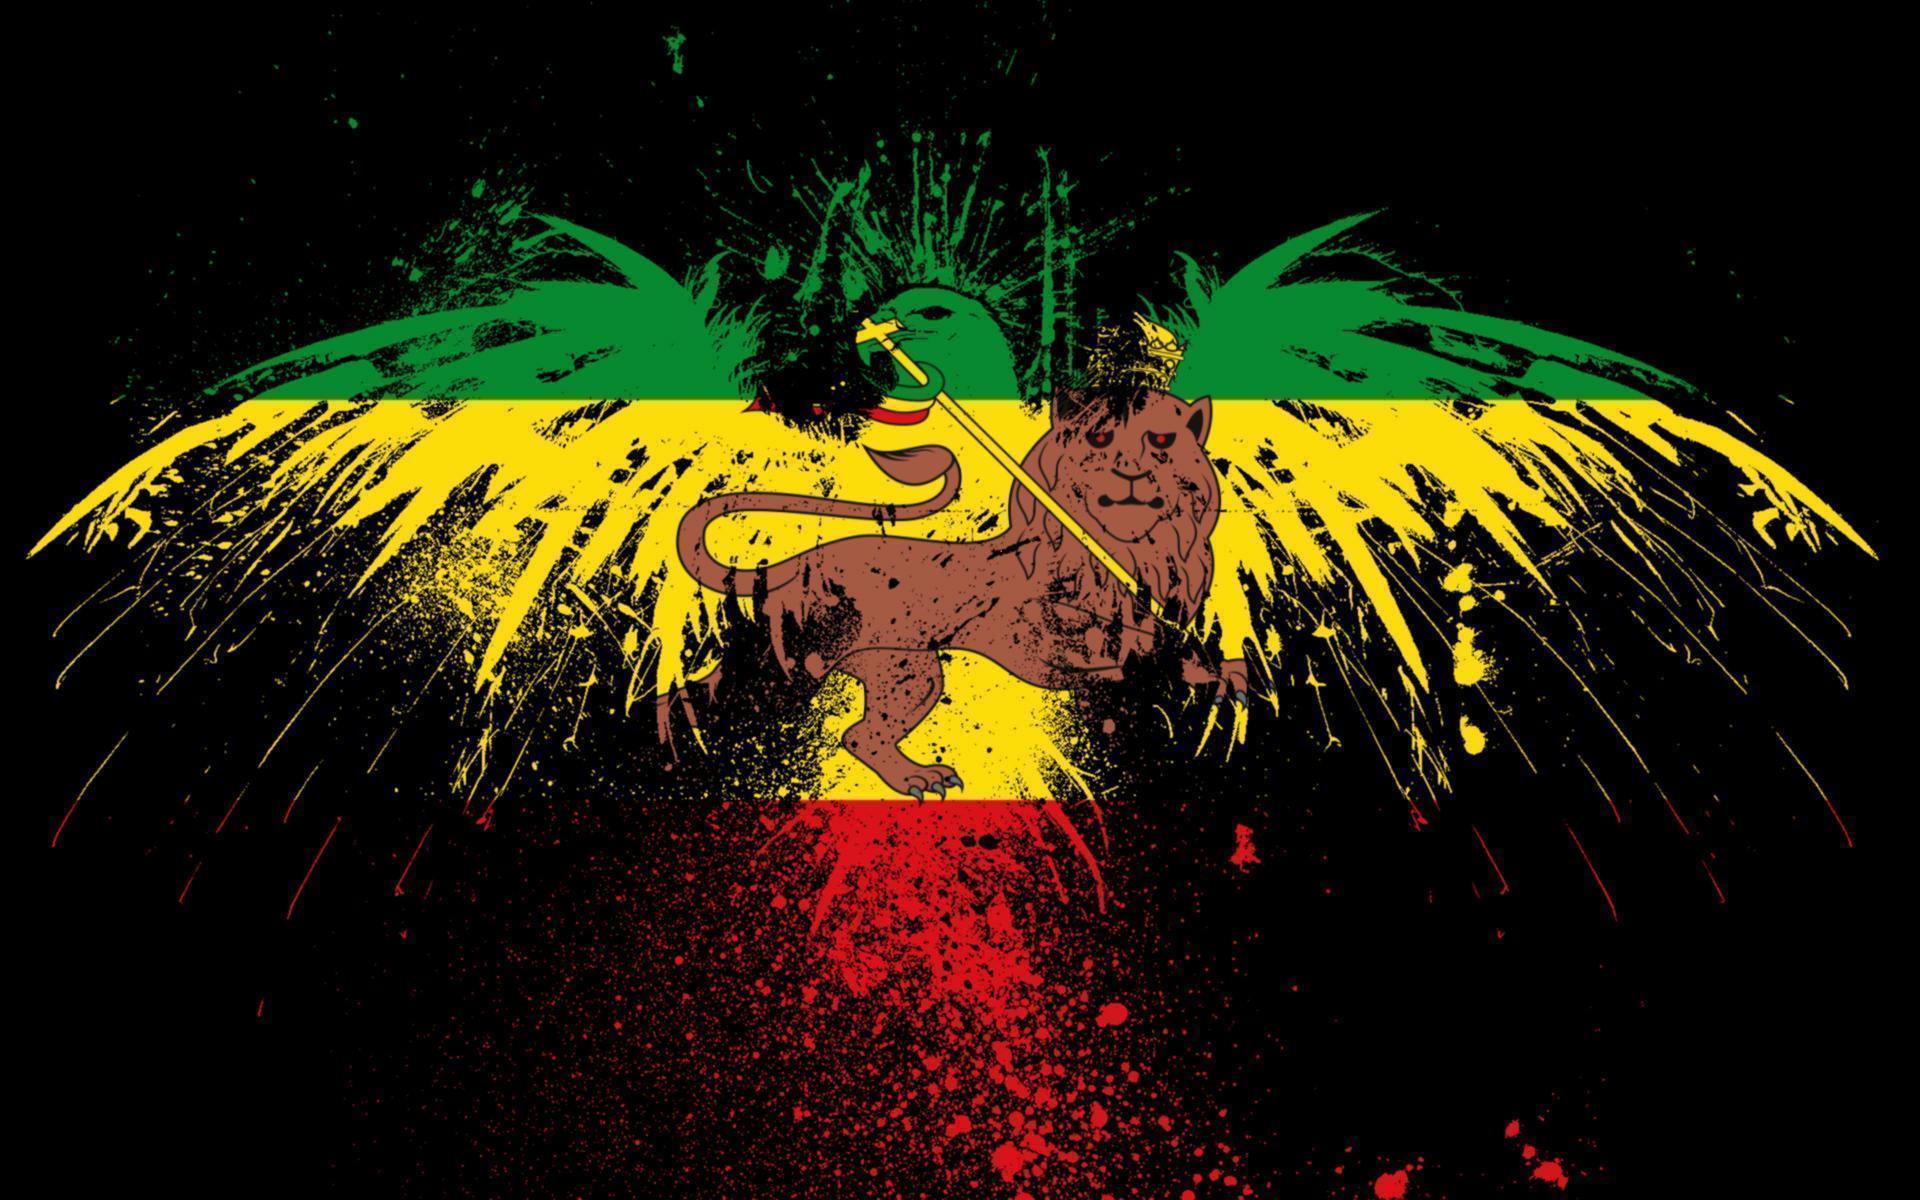 rastafarian lion wallpaper - photo #7